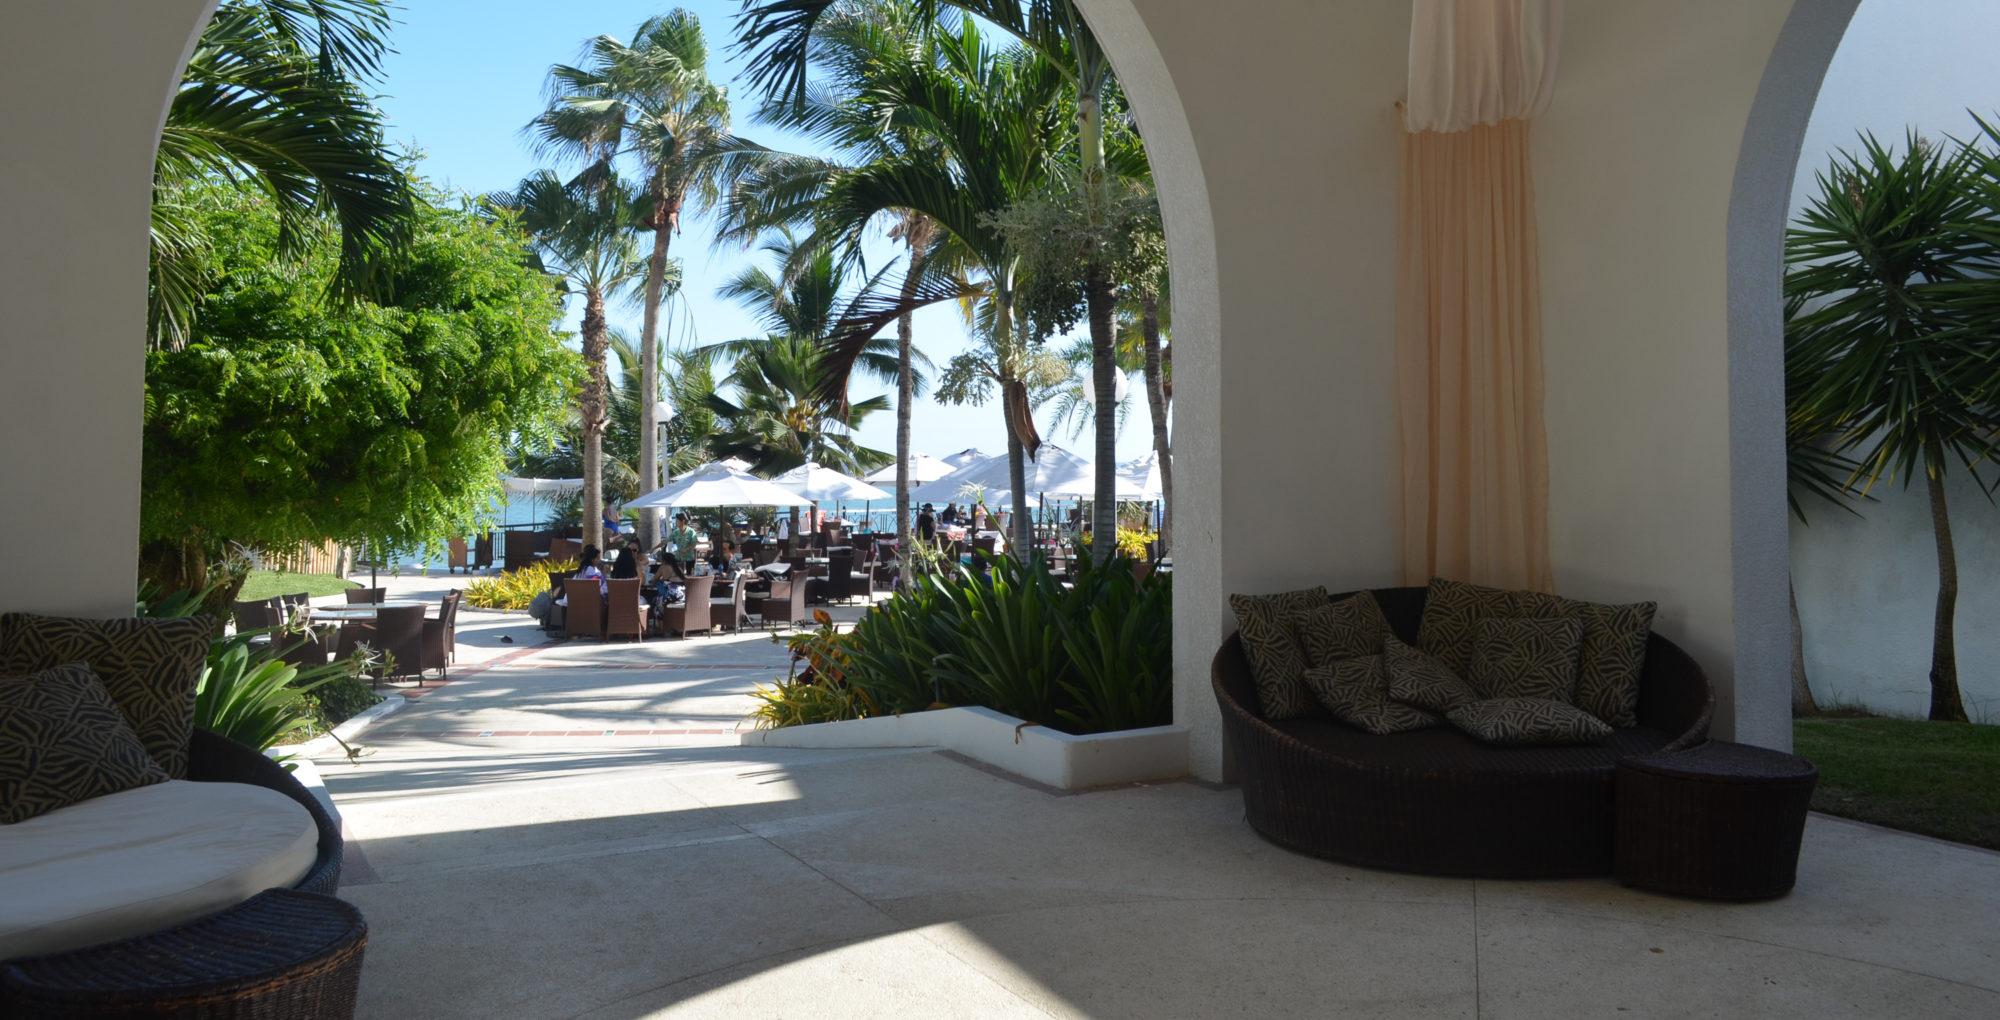 Ocean Club Playas International Associate Clubs